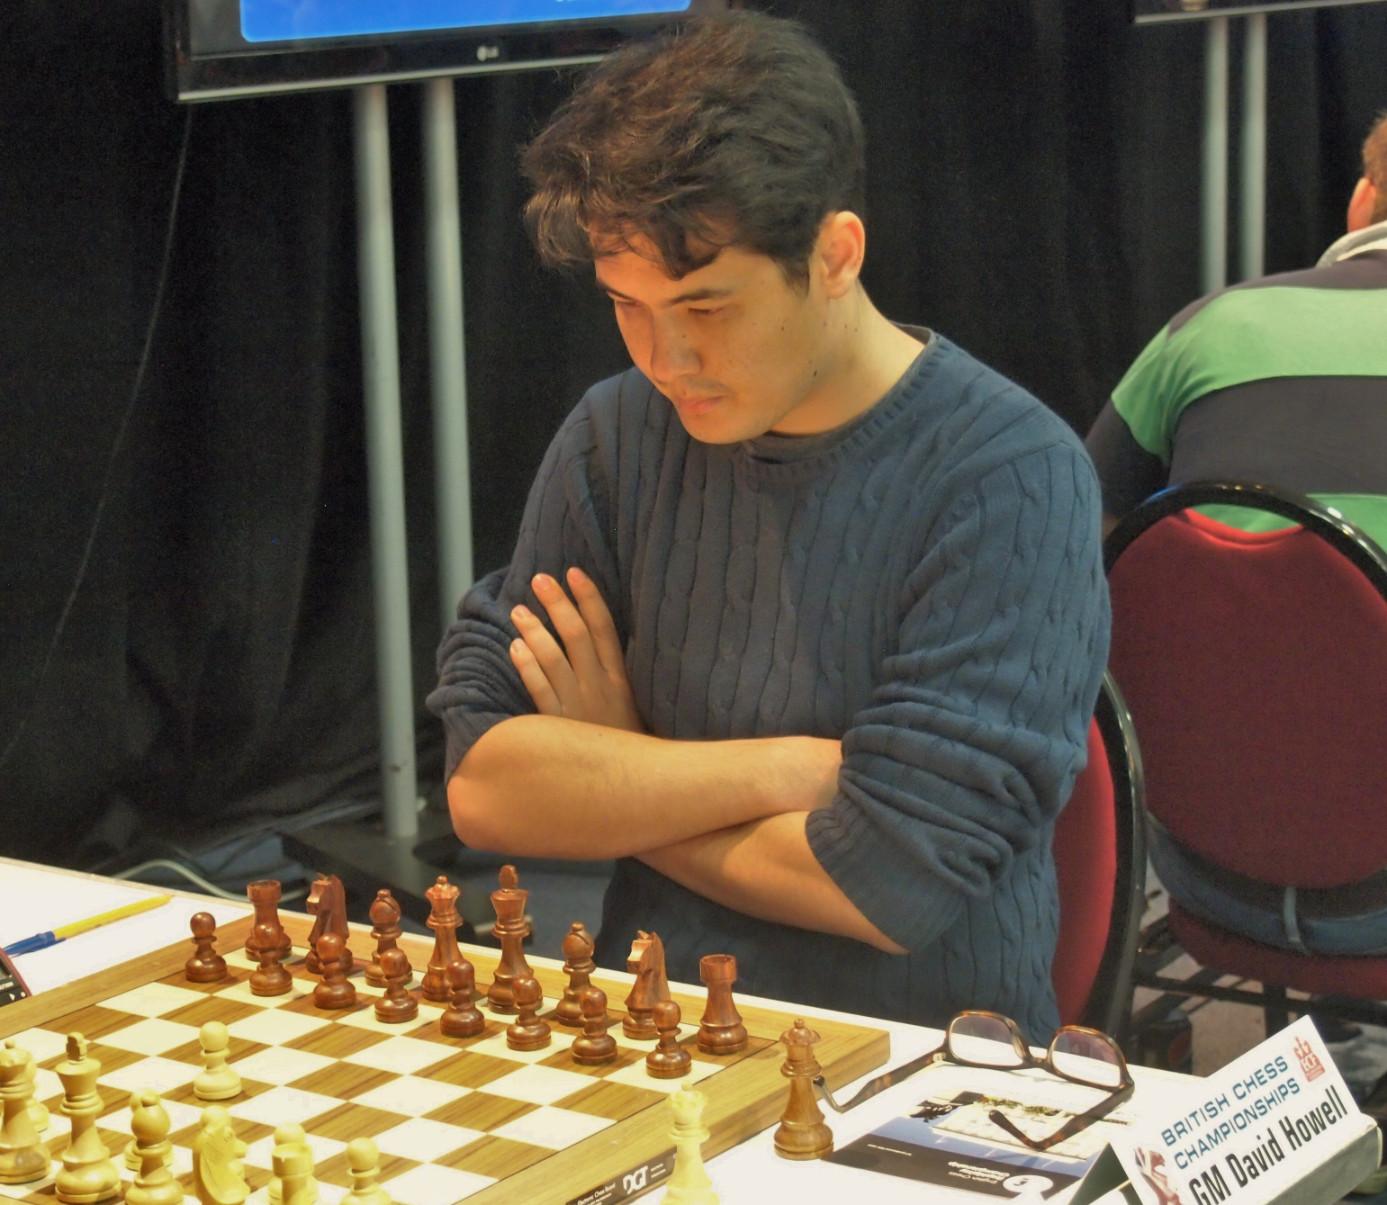 British chess championship 2018 prizes for baby